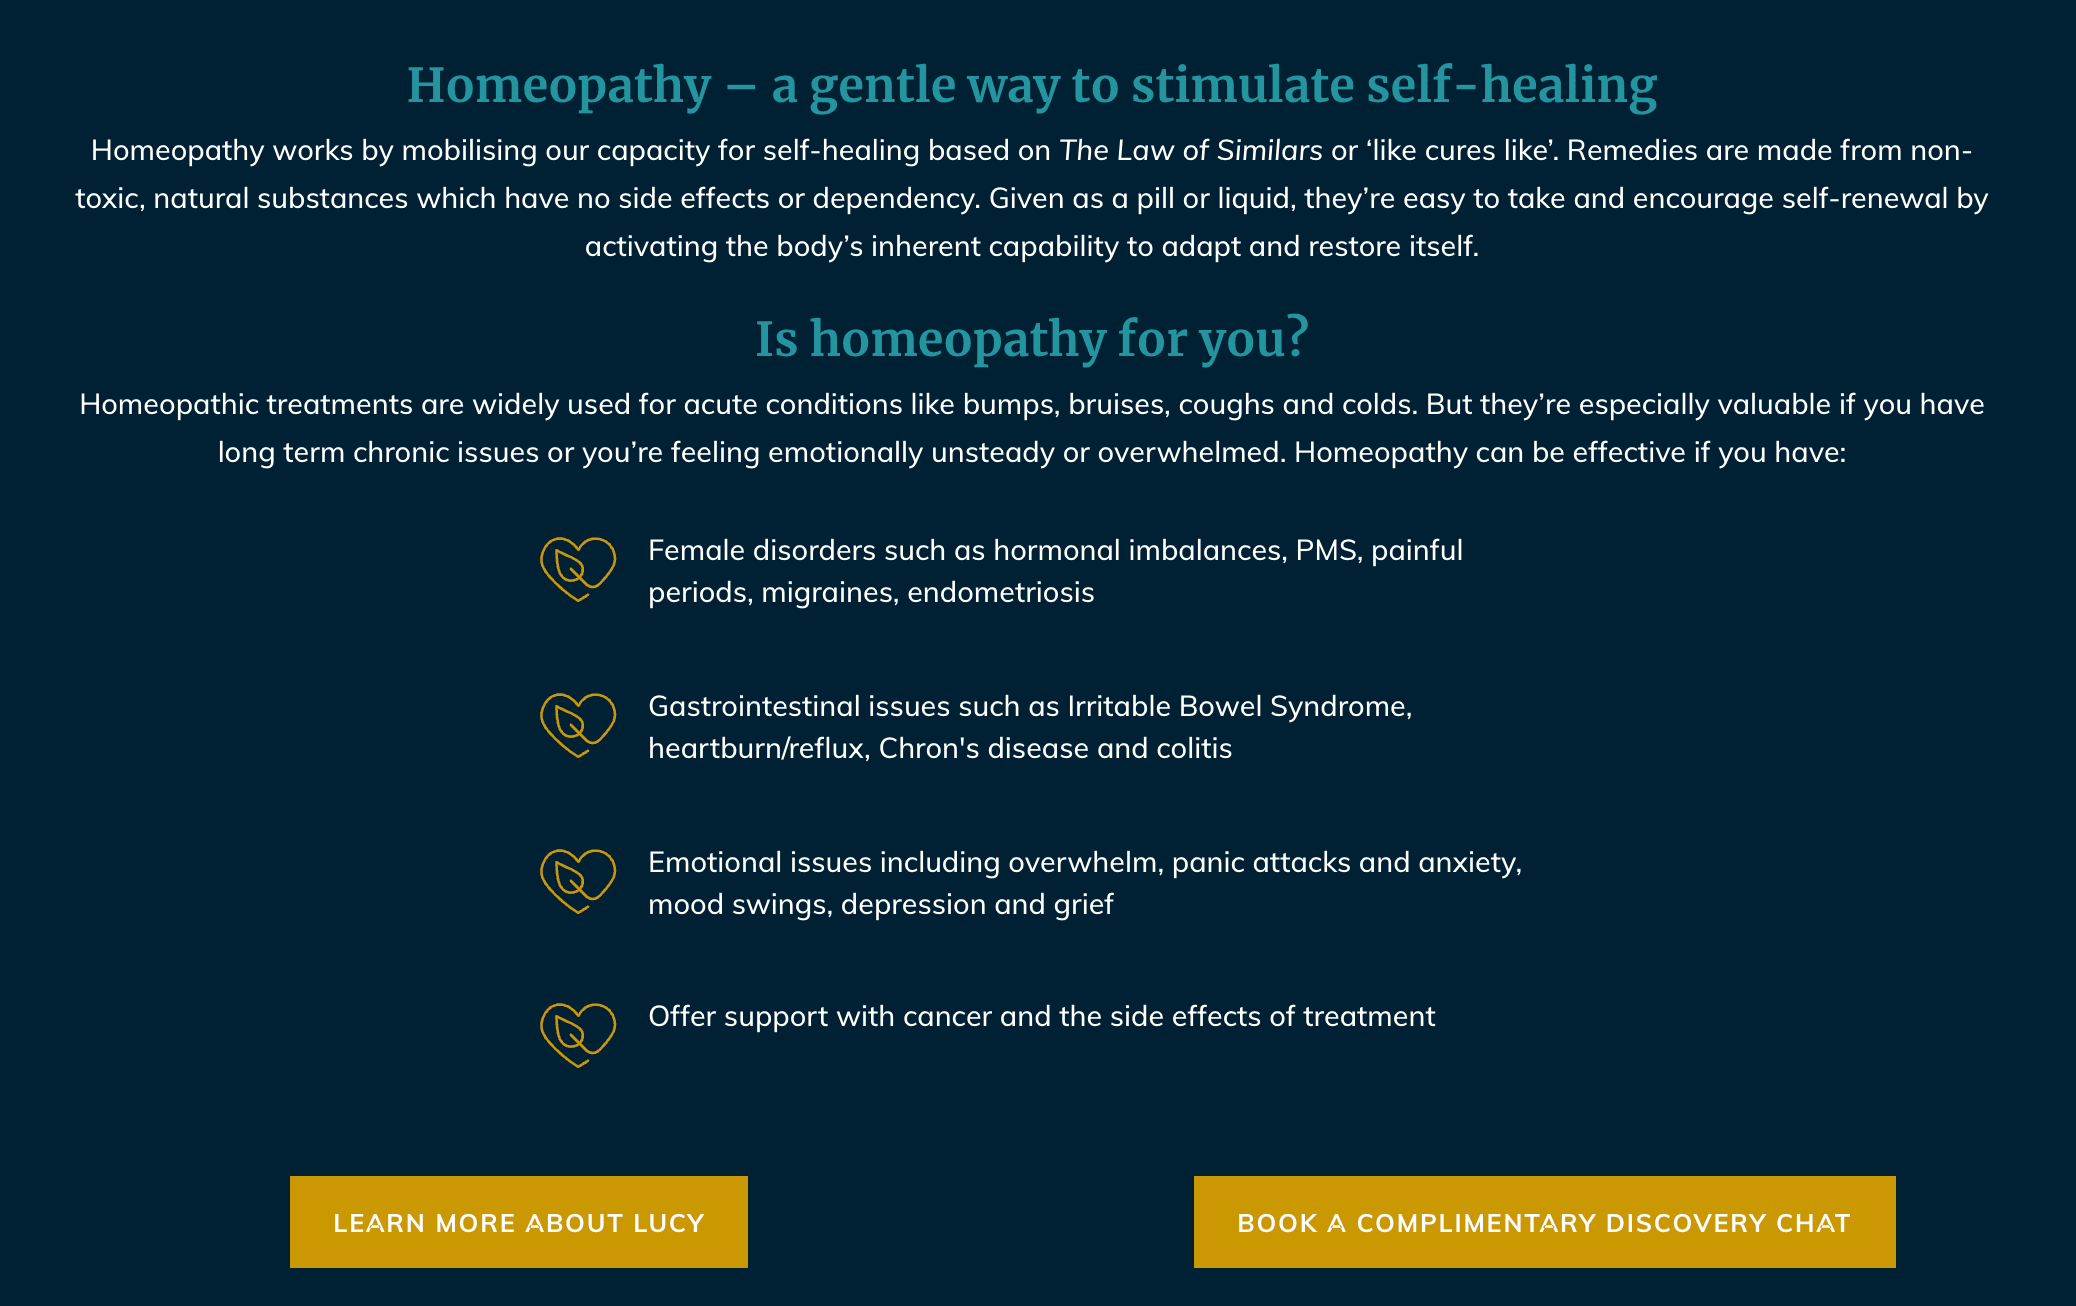 White-Feather-Homeopathy-copywriting-melbourne